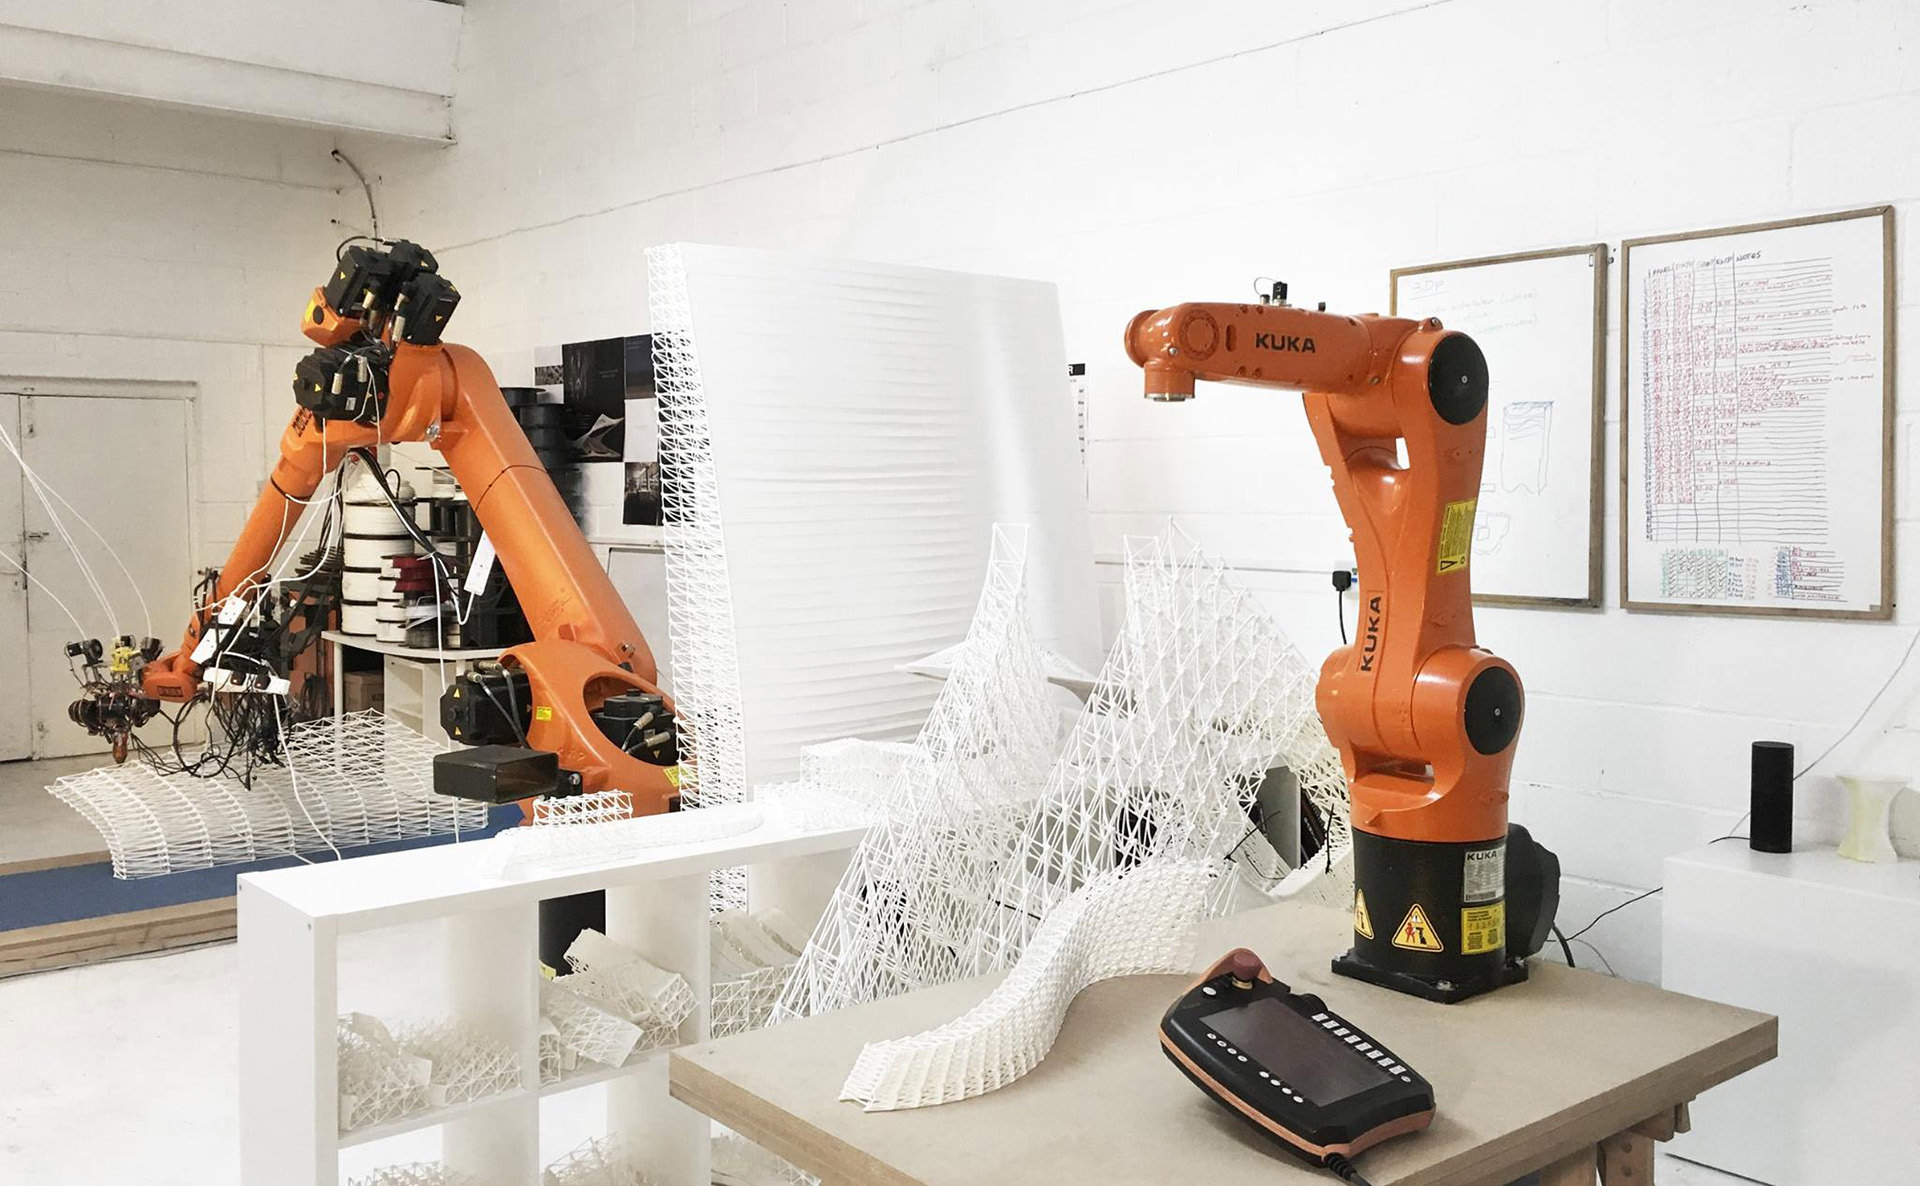 ai-build-3d-printing-technology-5